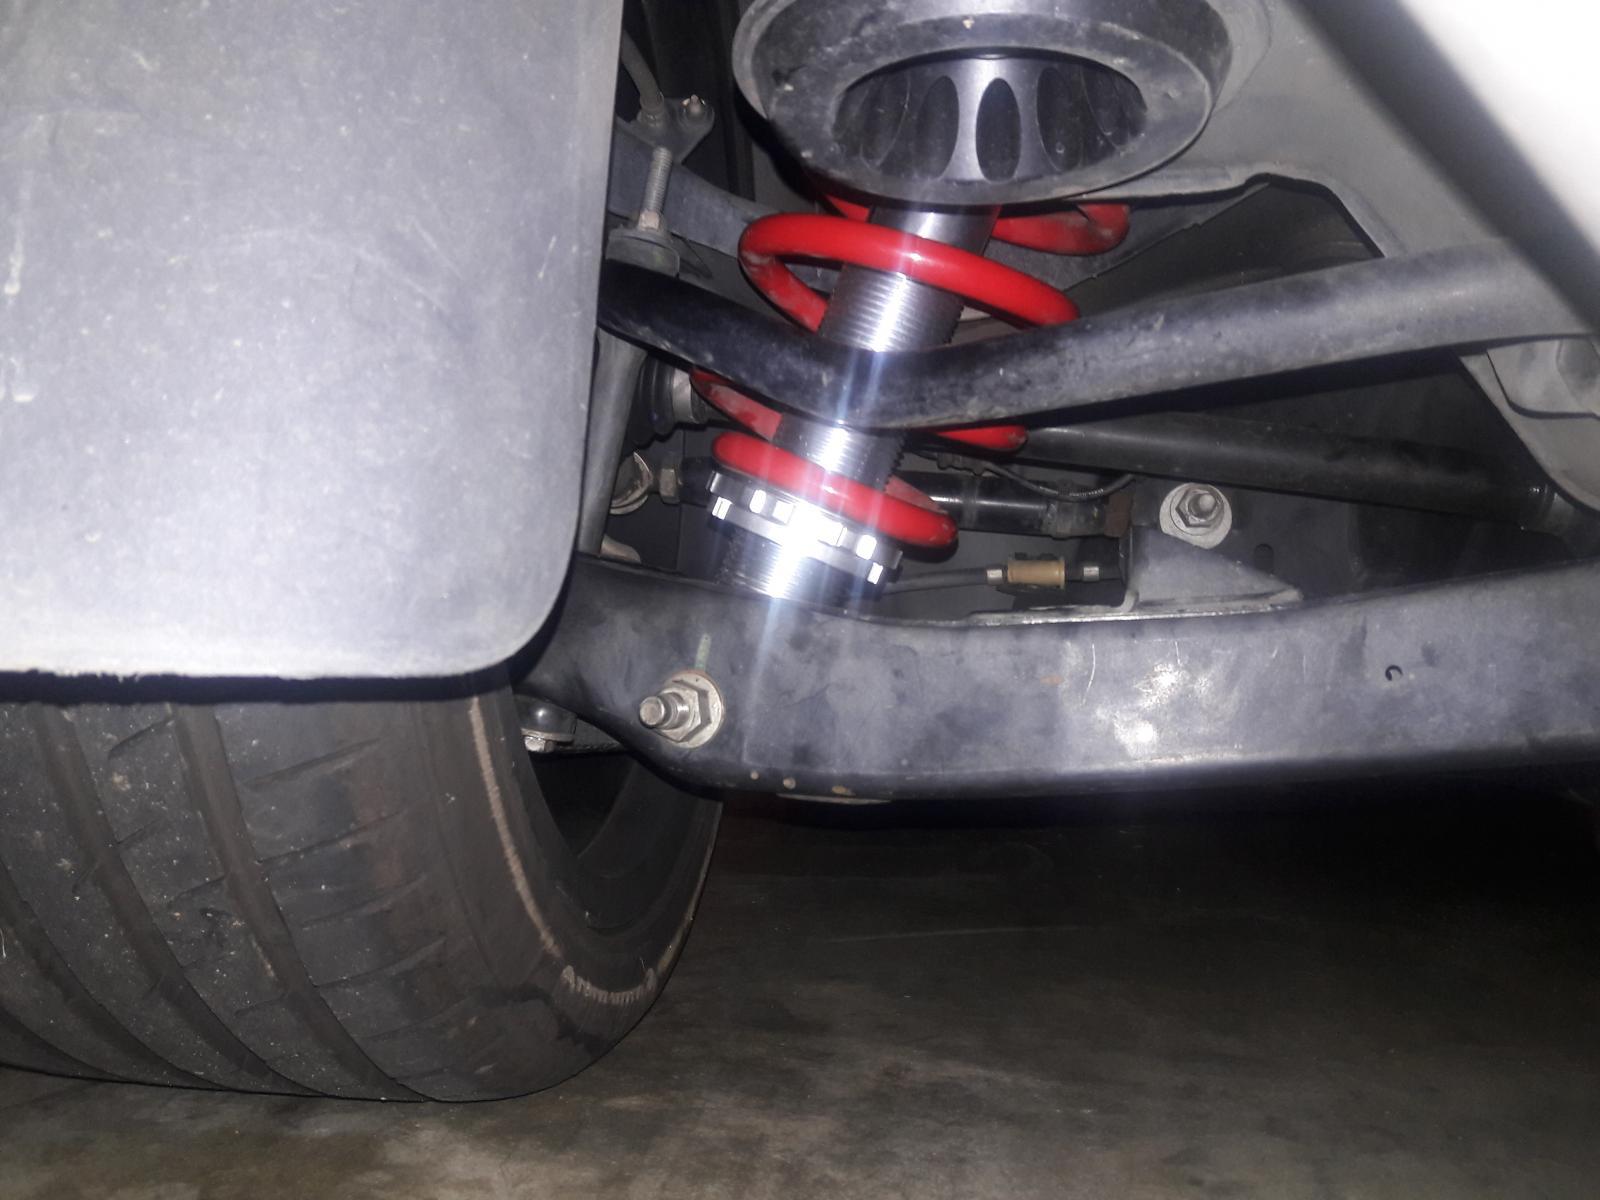 Viking Rear shocks / BMR spring - Camaro5 Chevy Camaro Forum